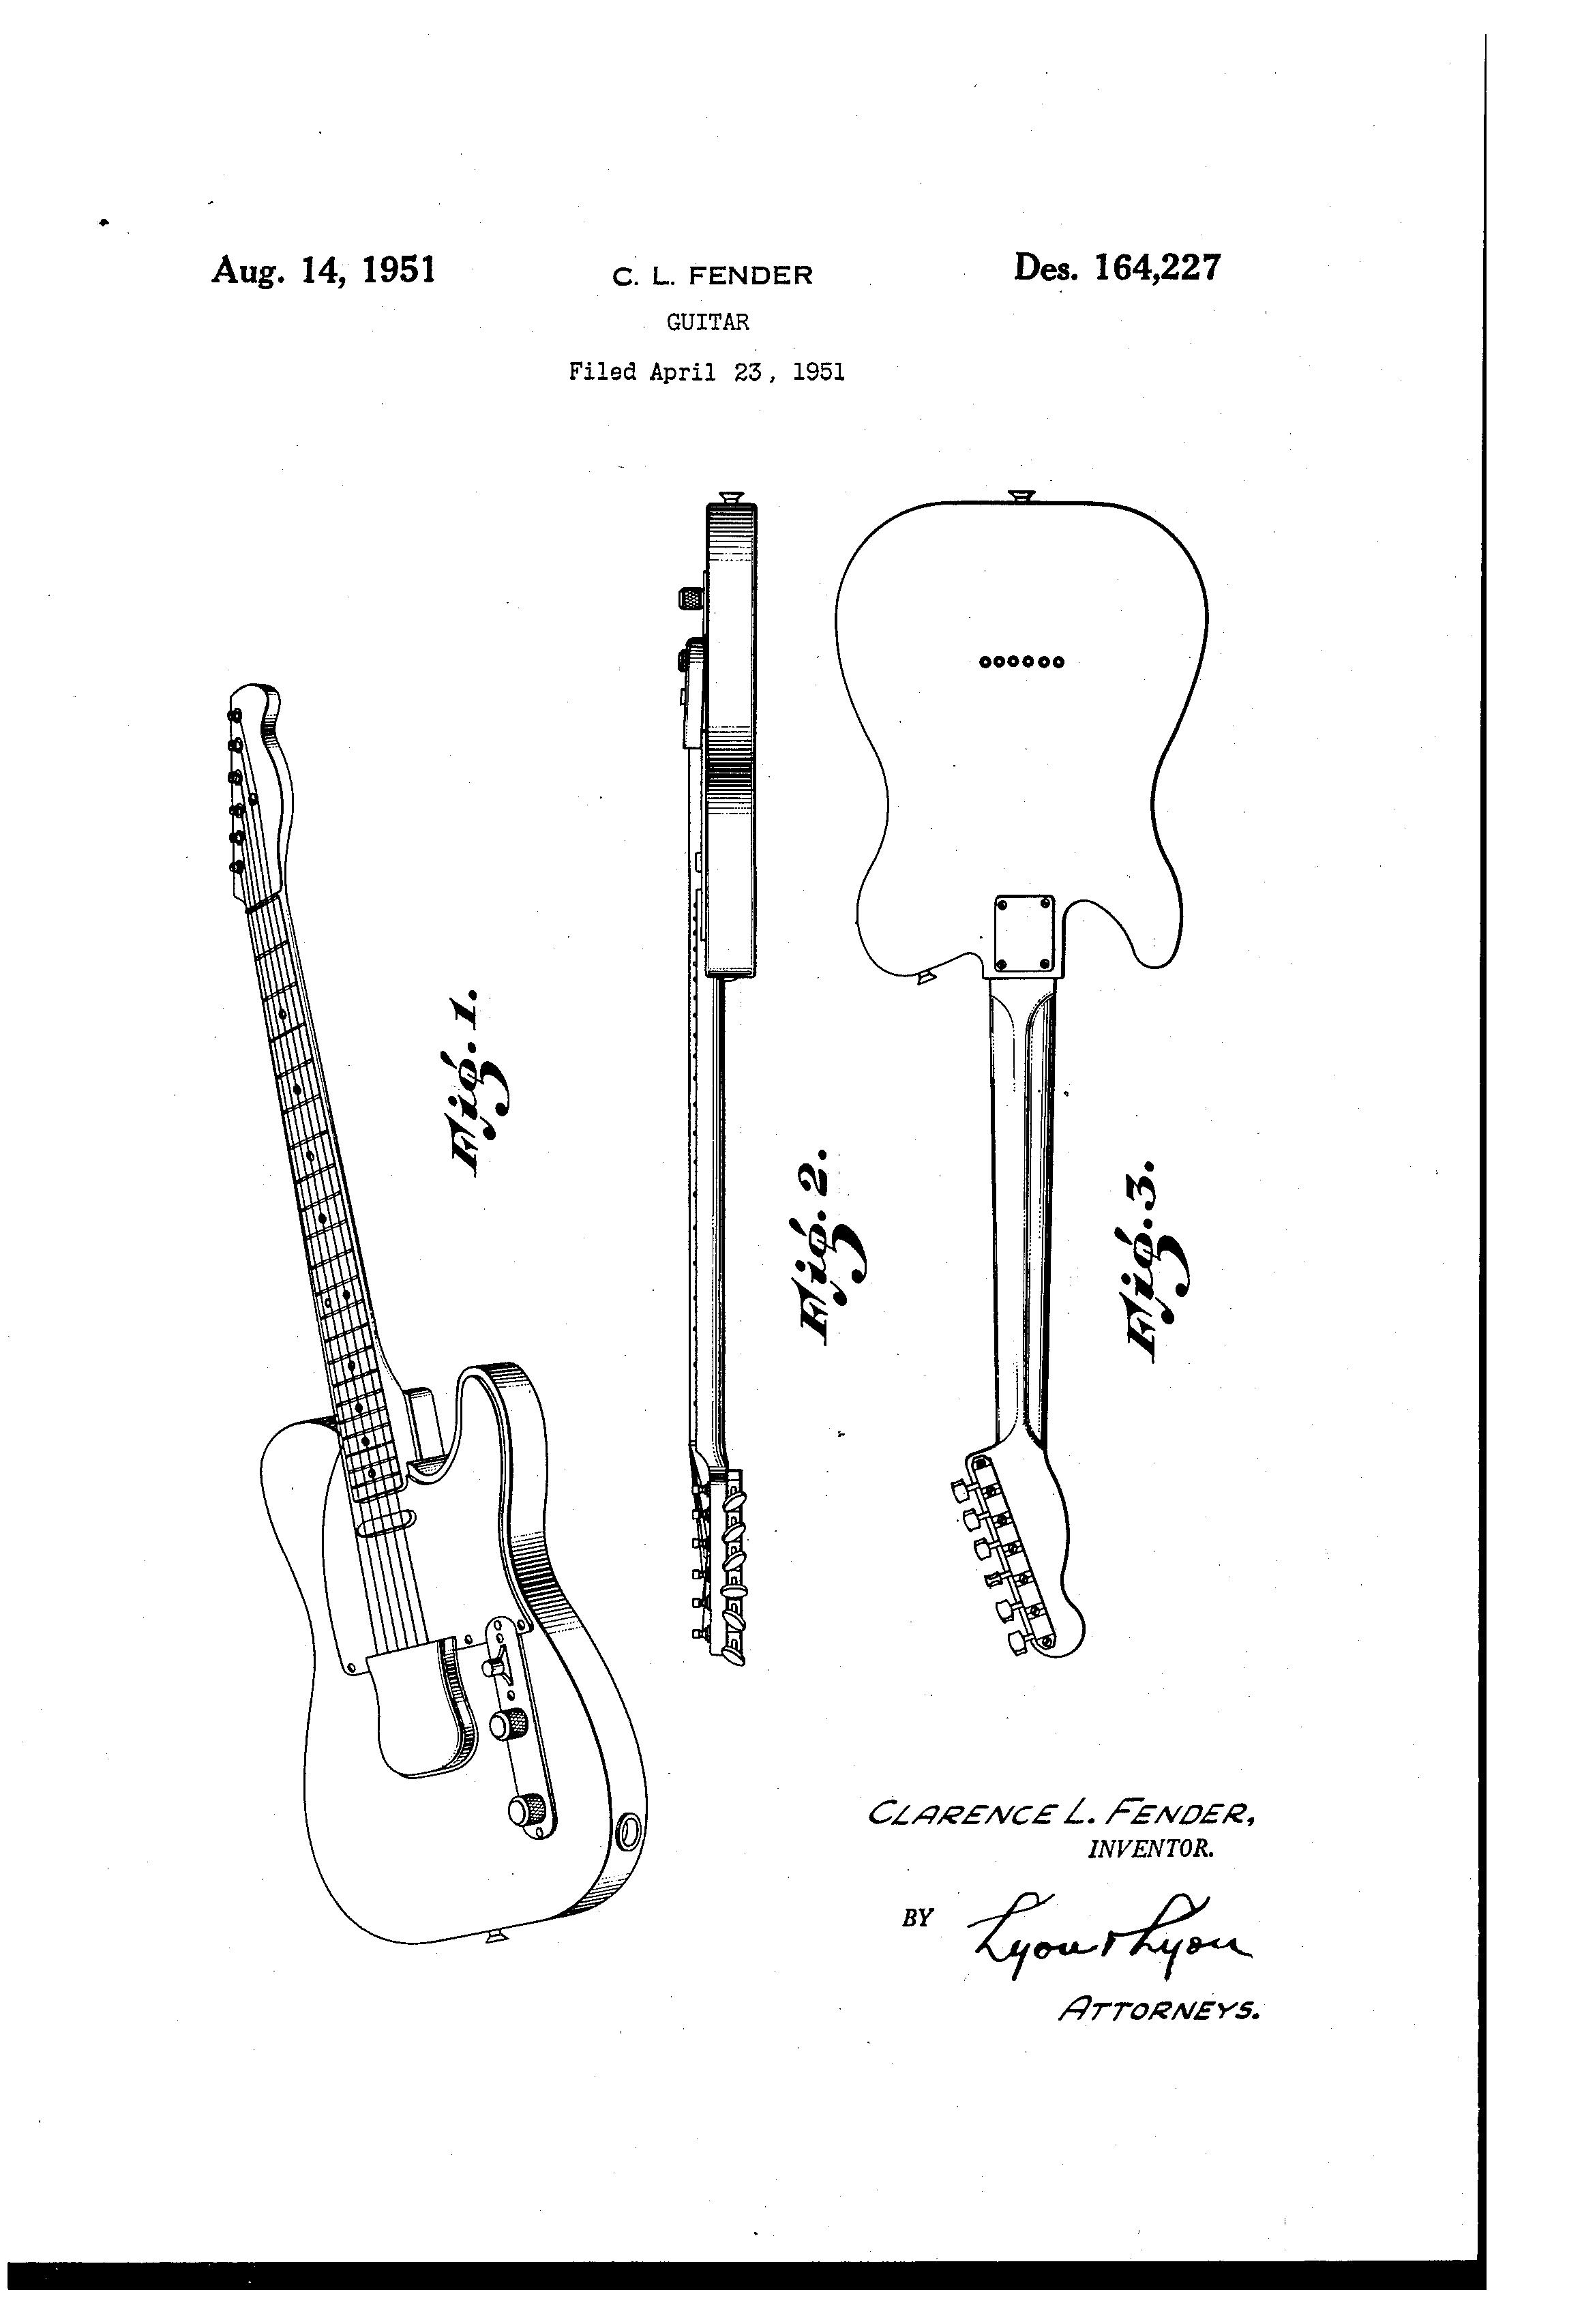 hight resolution of patent usd164227 fender guitar google patents